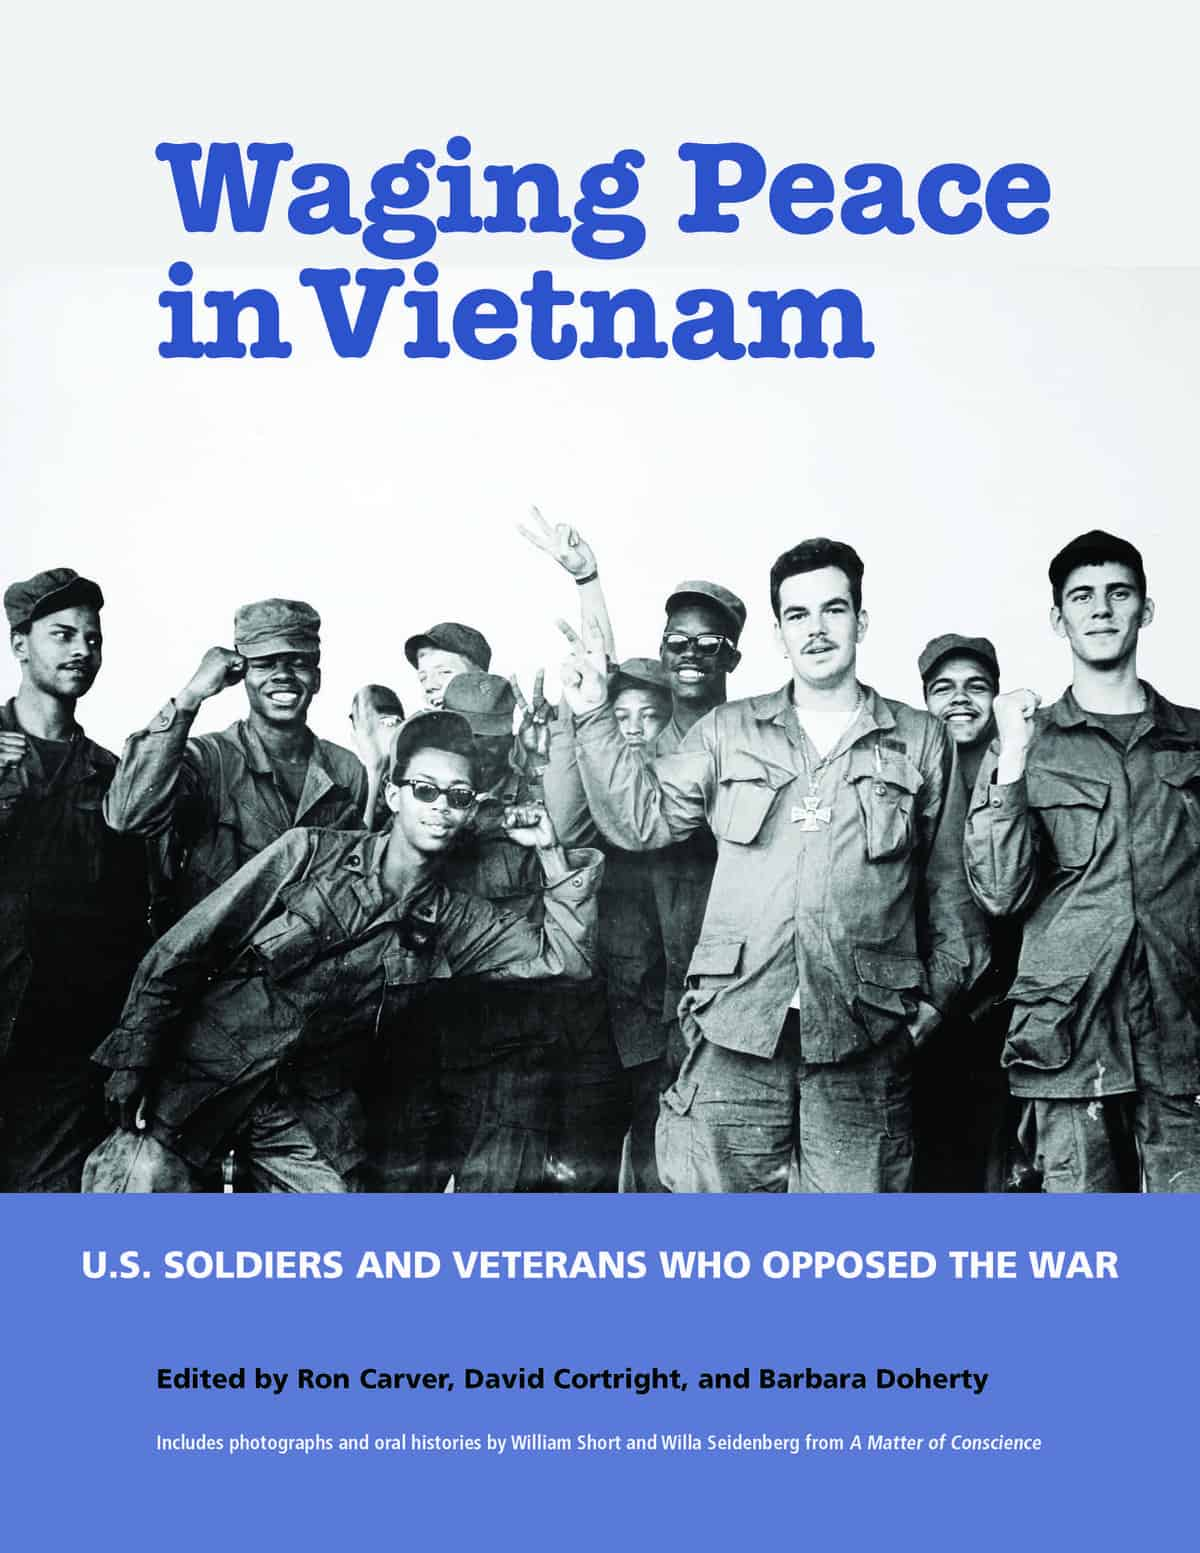 Background Resources - Vietnam Full Disclosure